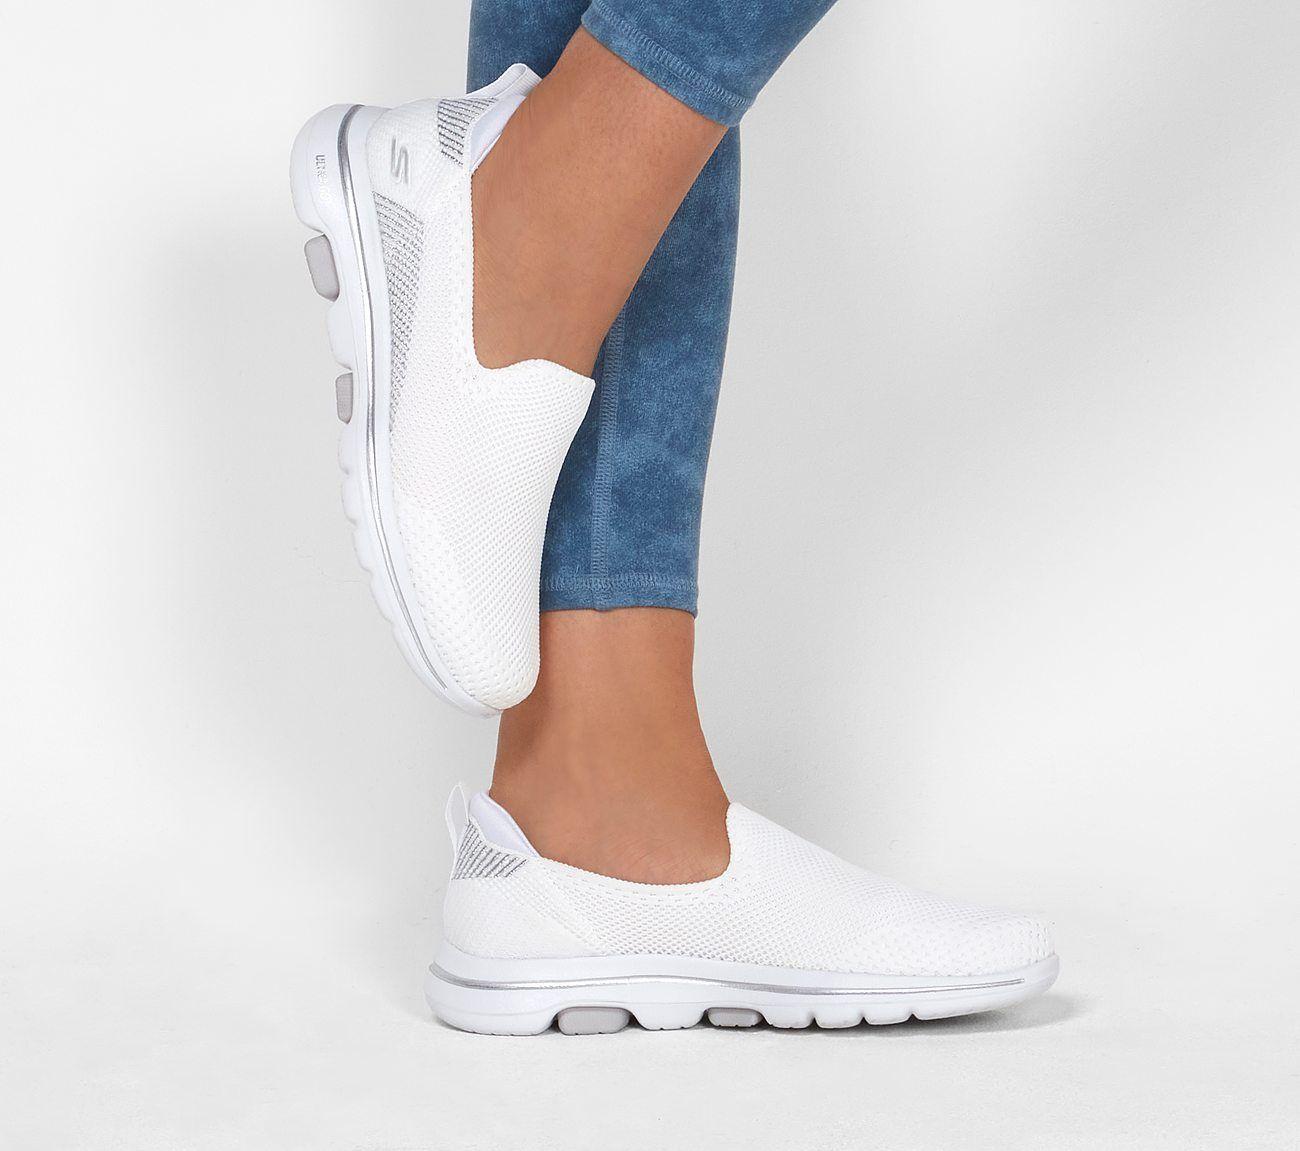 Gowalk 5 Prized En 2020 Zapatos